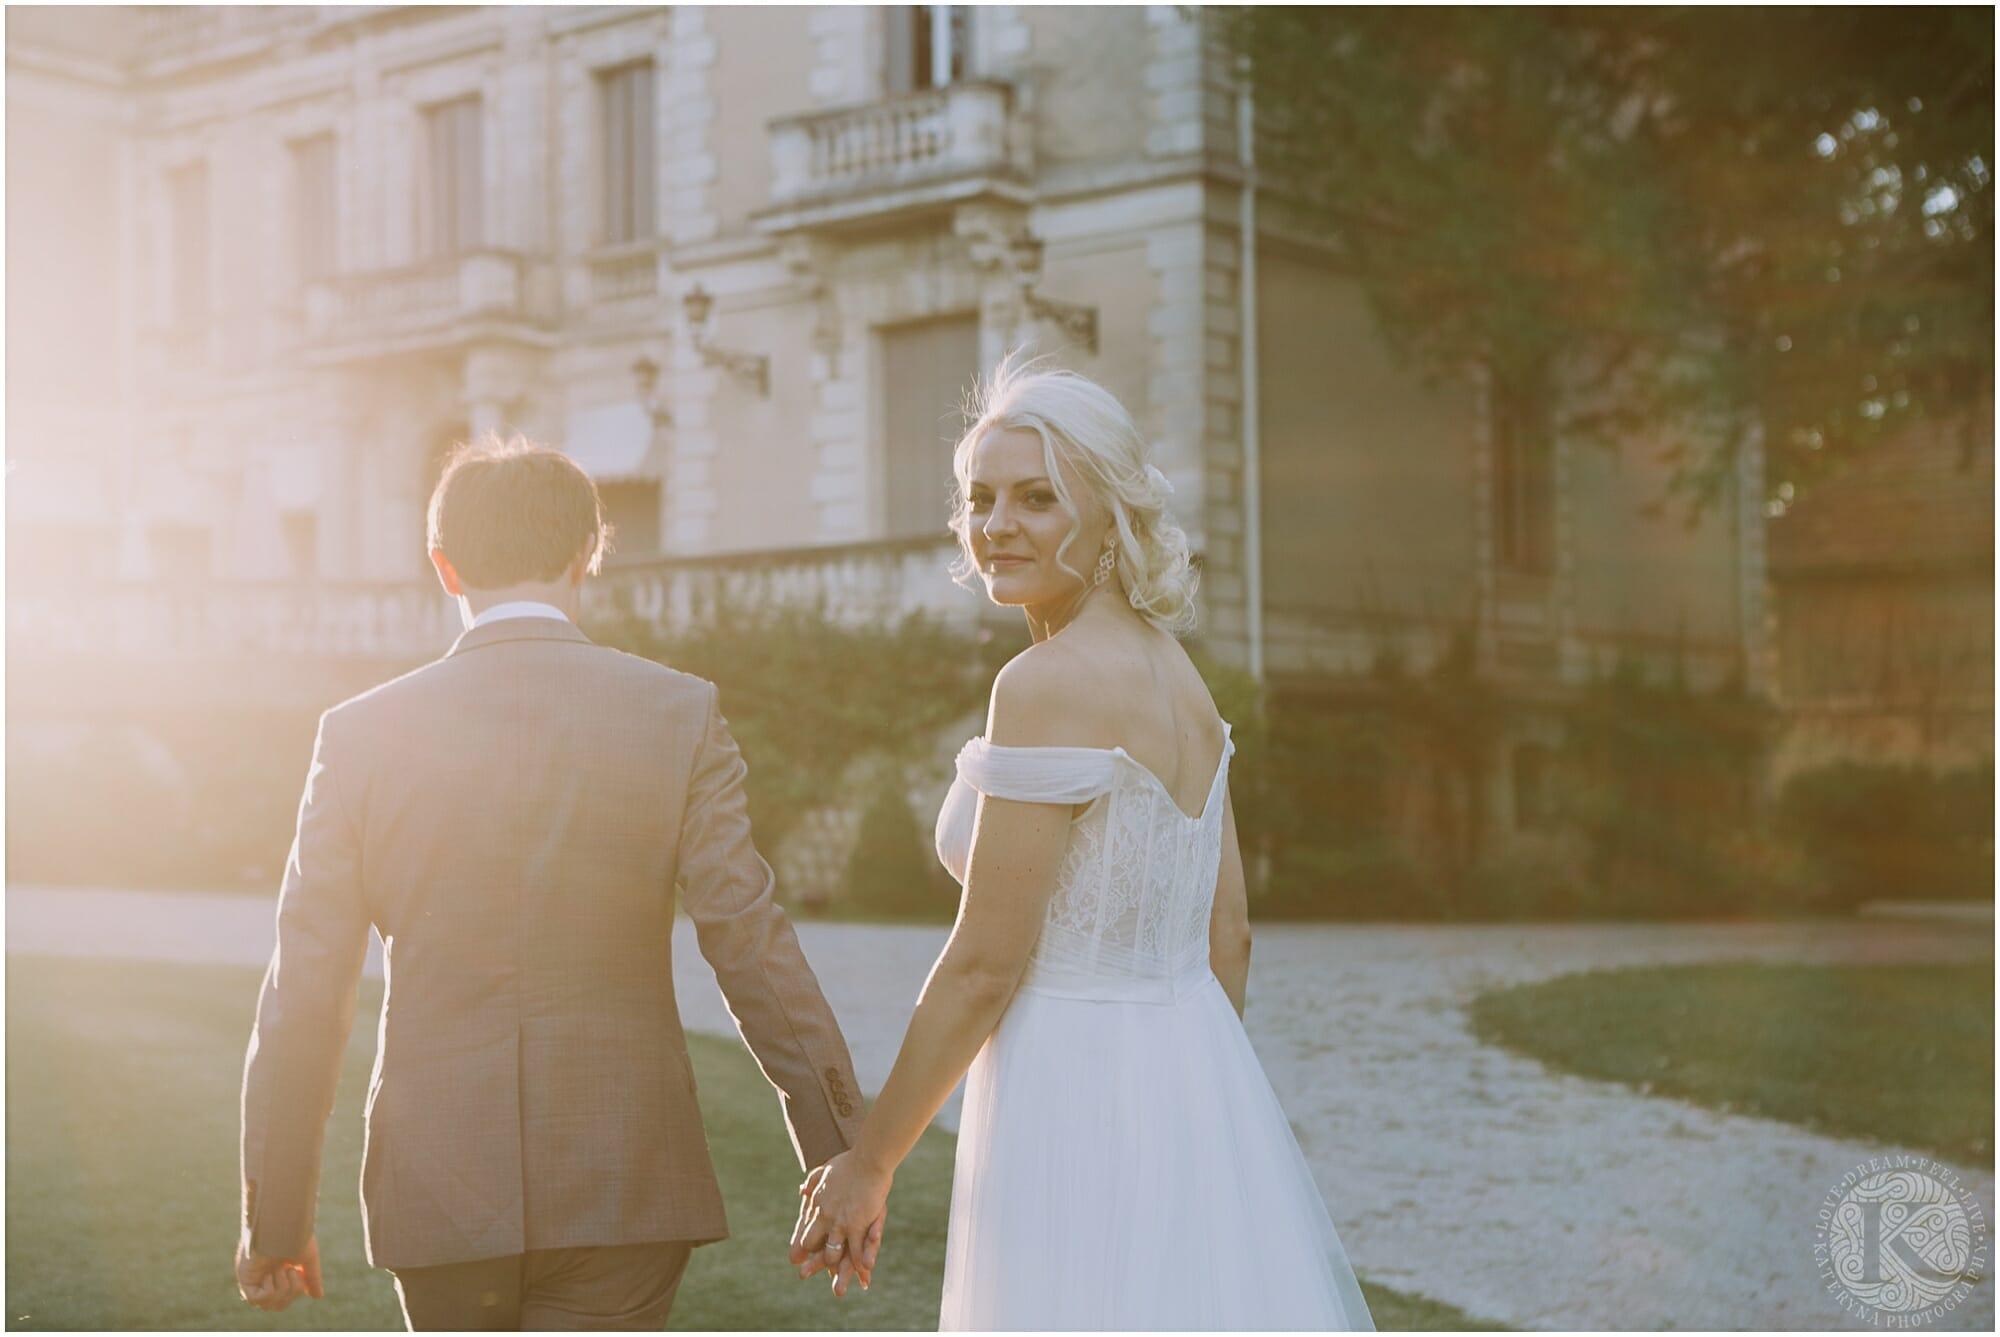 Kateryna-photos-photographe-mariage-chateau-des-3-fontaines-provence-avignon-vaucluse-sud_0103.jpg